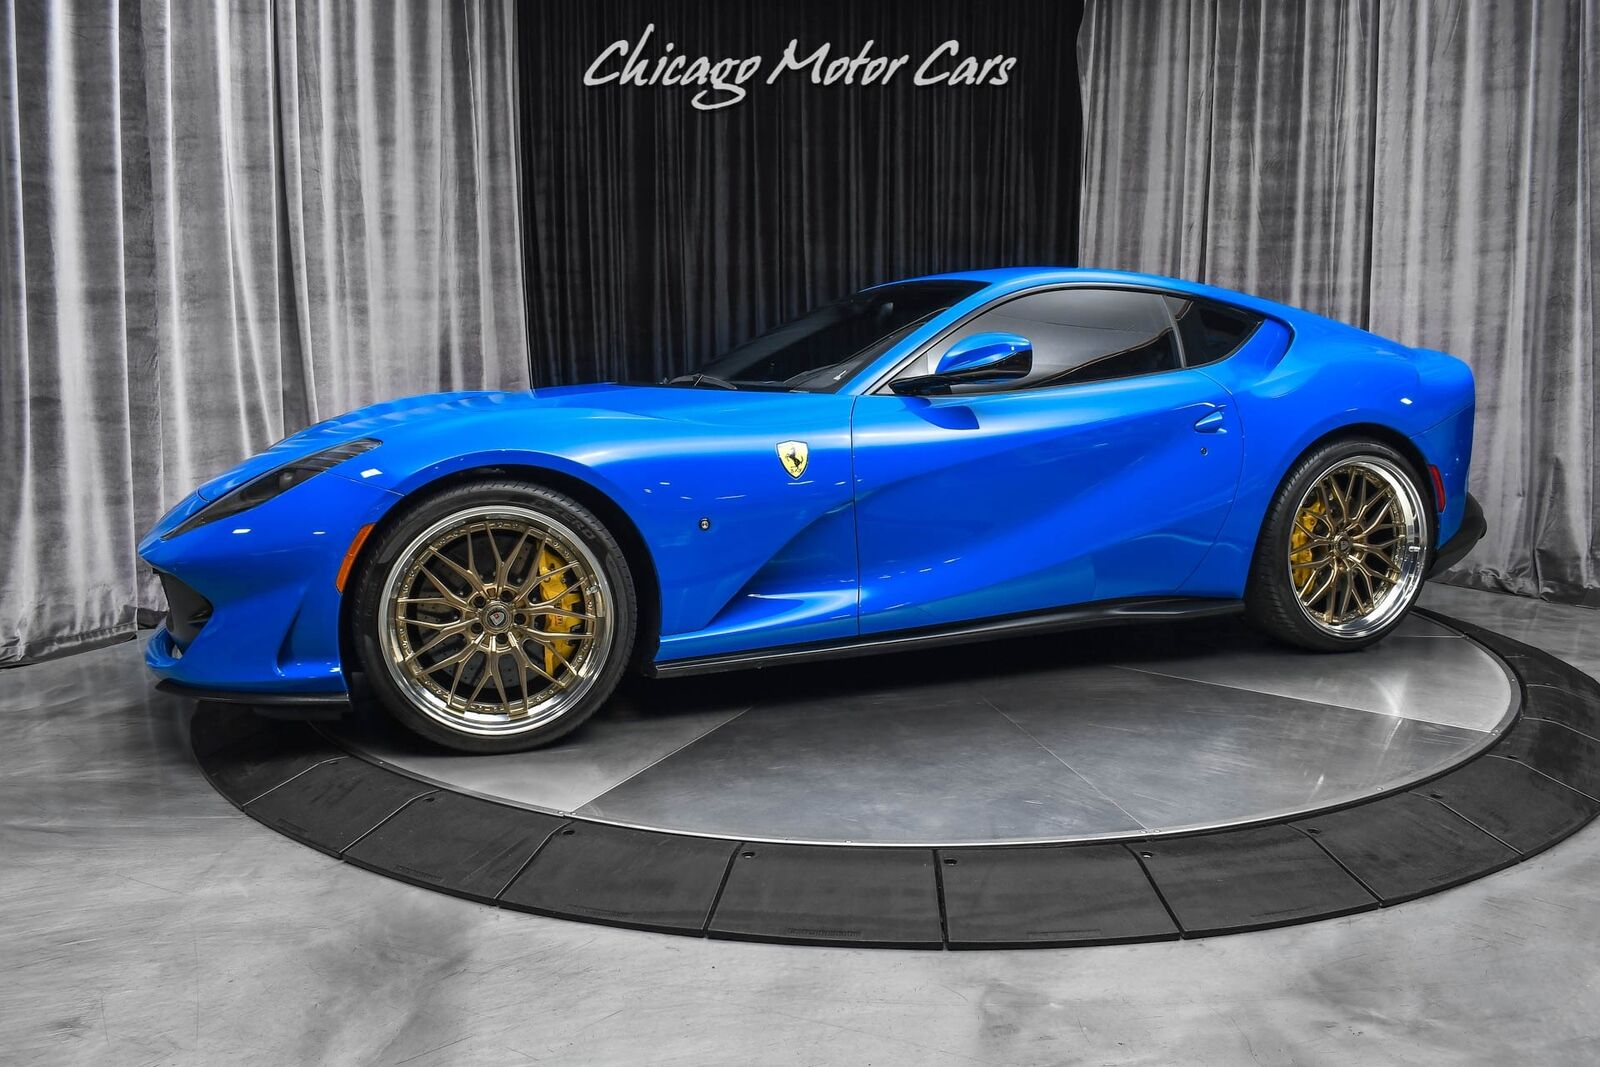 2019 Ferrari 812 Superfast RARE Azzurro Dino Paint! FULL PPF! Capristo Exhaus